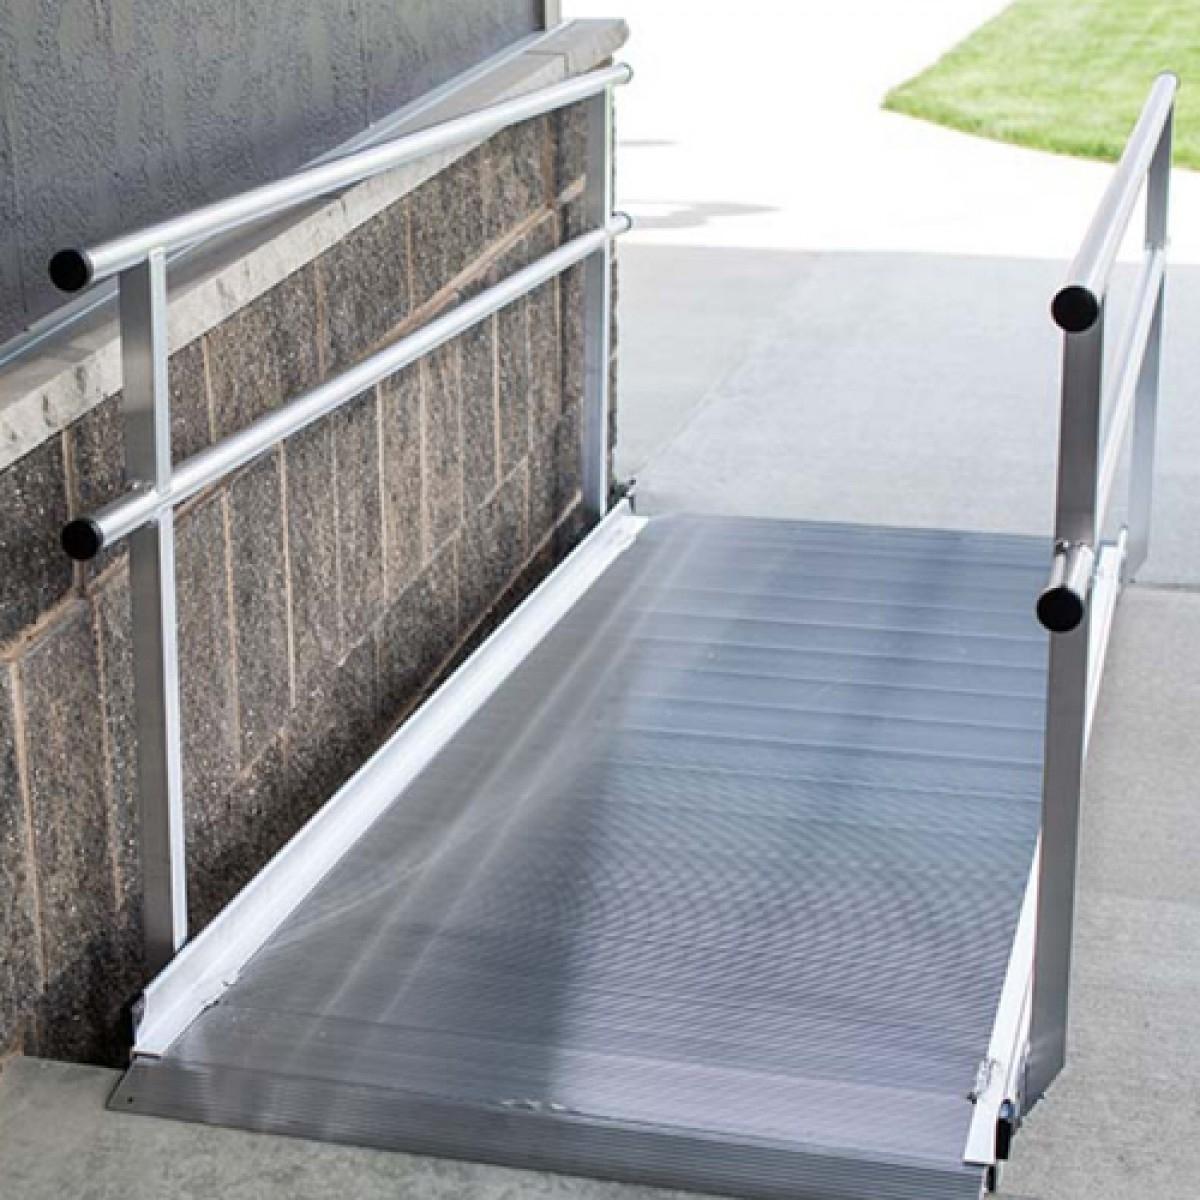 diy wheelchair ramp for stairs – madison art center design